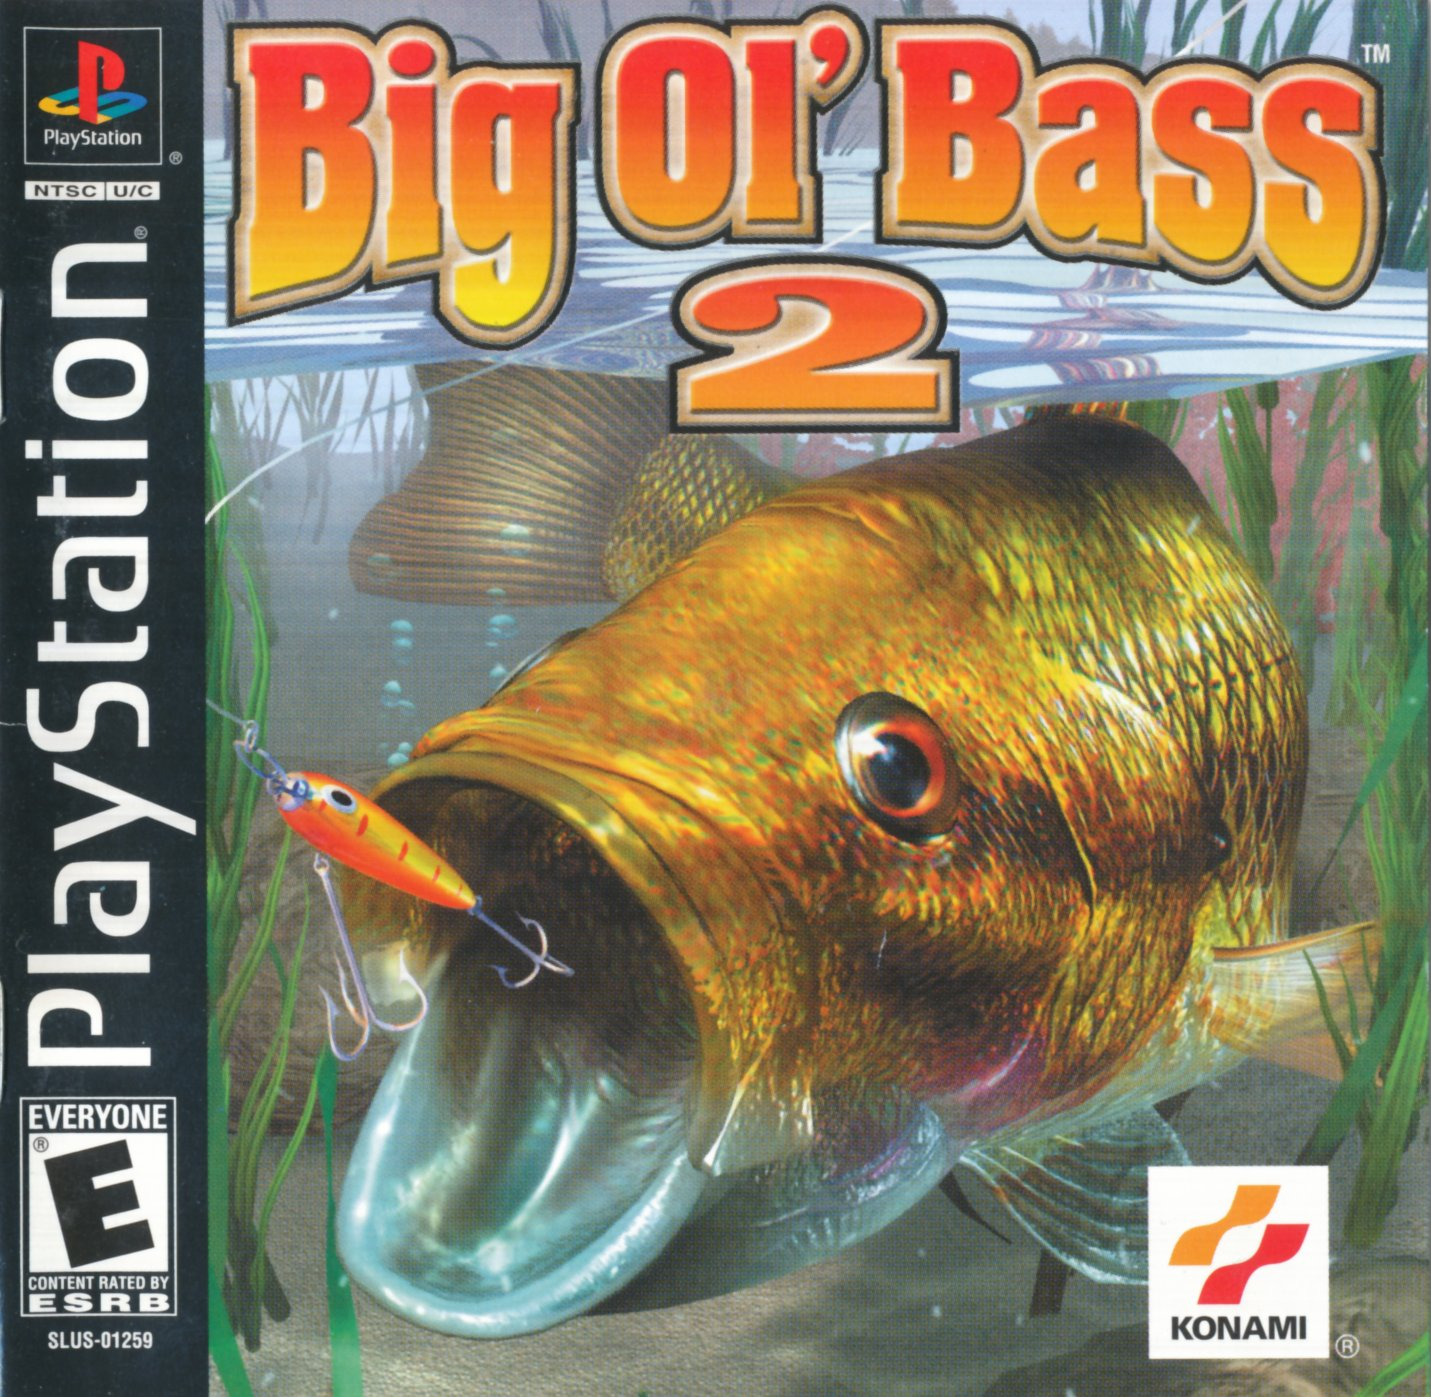 Fisherman's bait big ol' bass 2 (usa) psx / sony playstation iso.